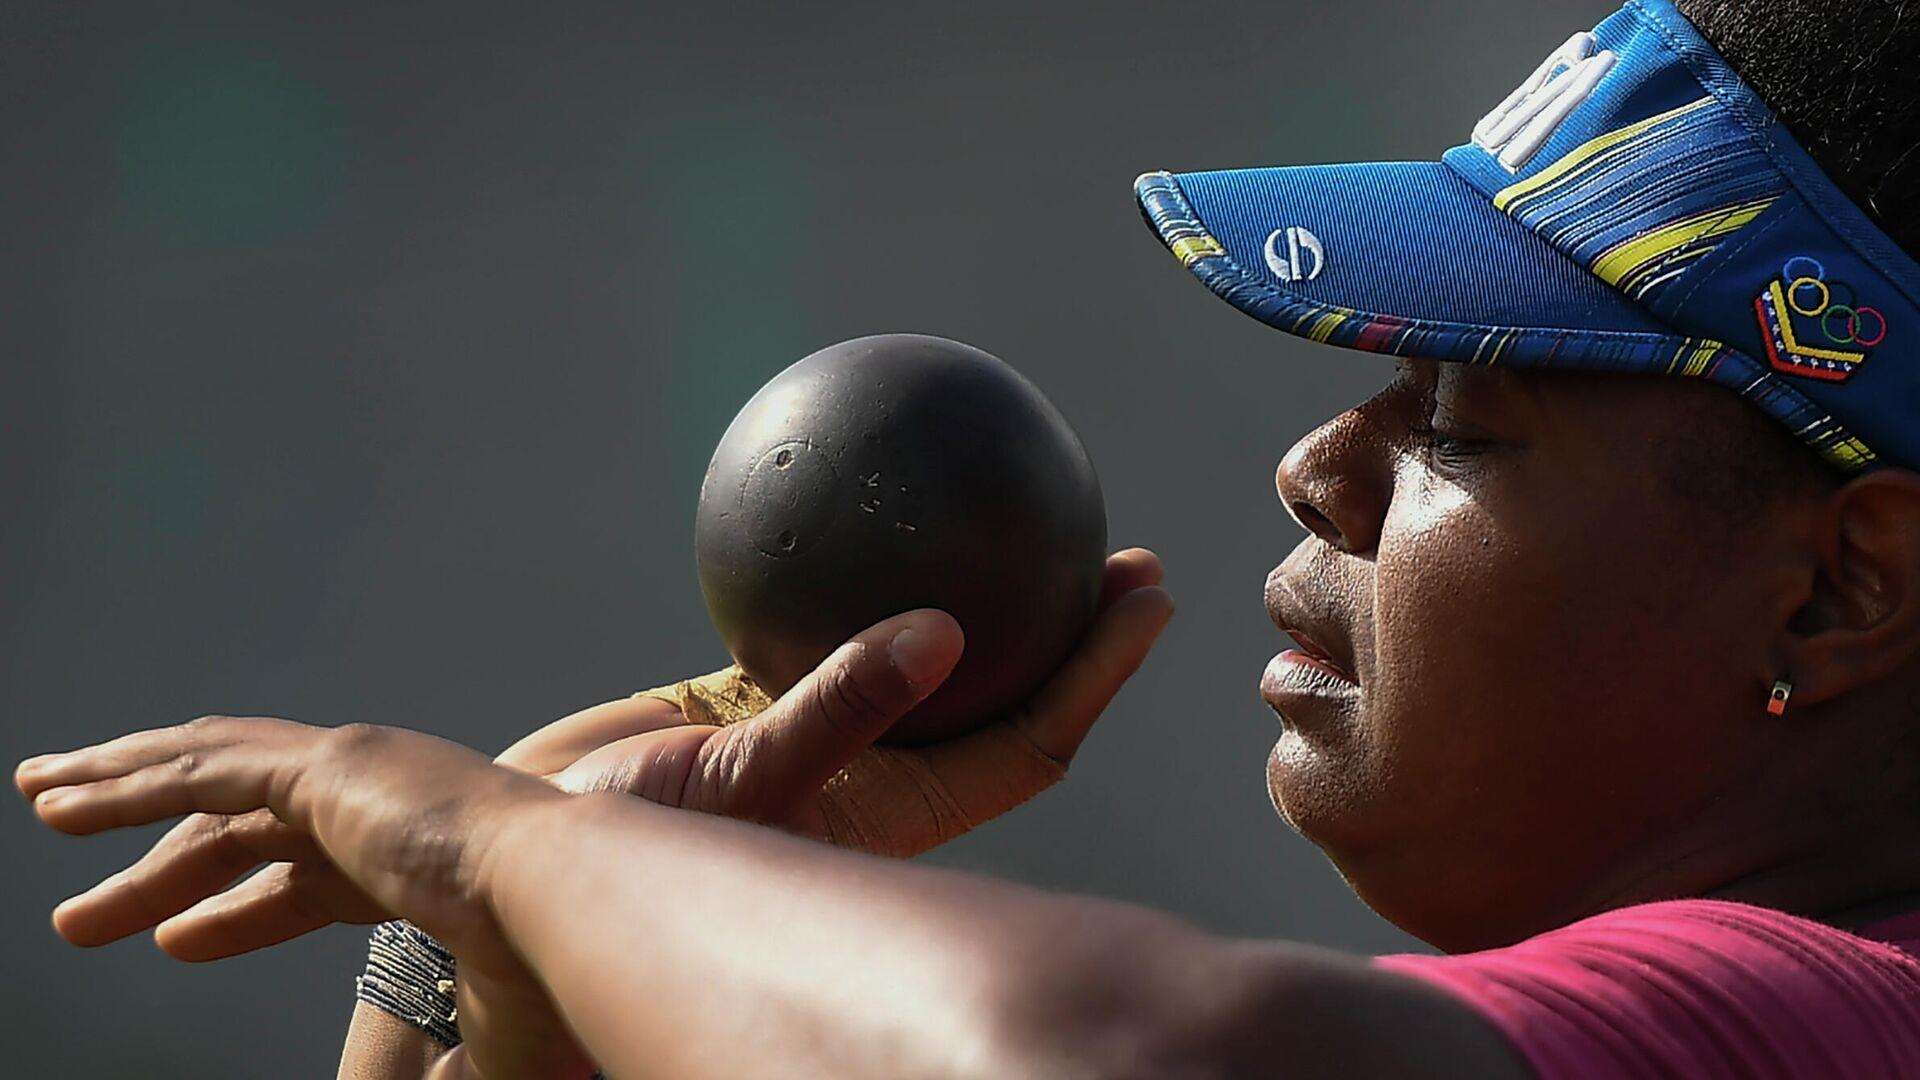 Ahymara Espinoza, atleta venezolana de lanzamiento de bala - Sputnik Mundo, 1920, 23.07.2021